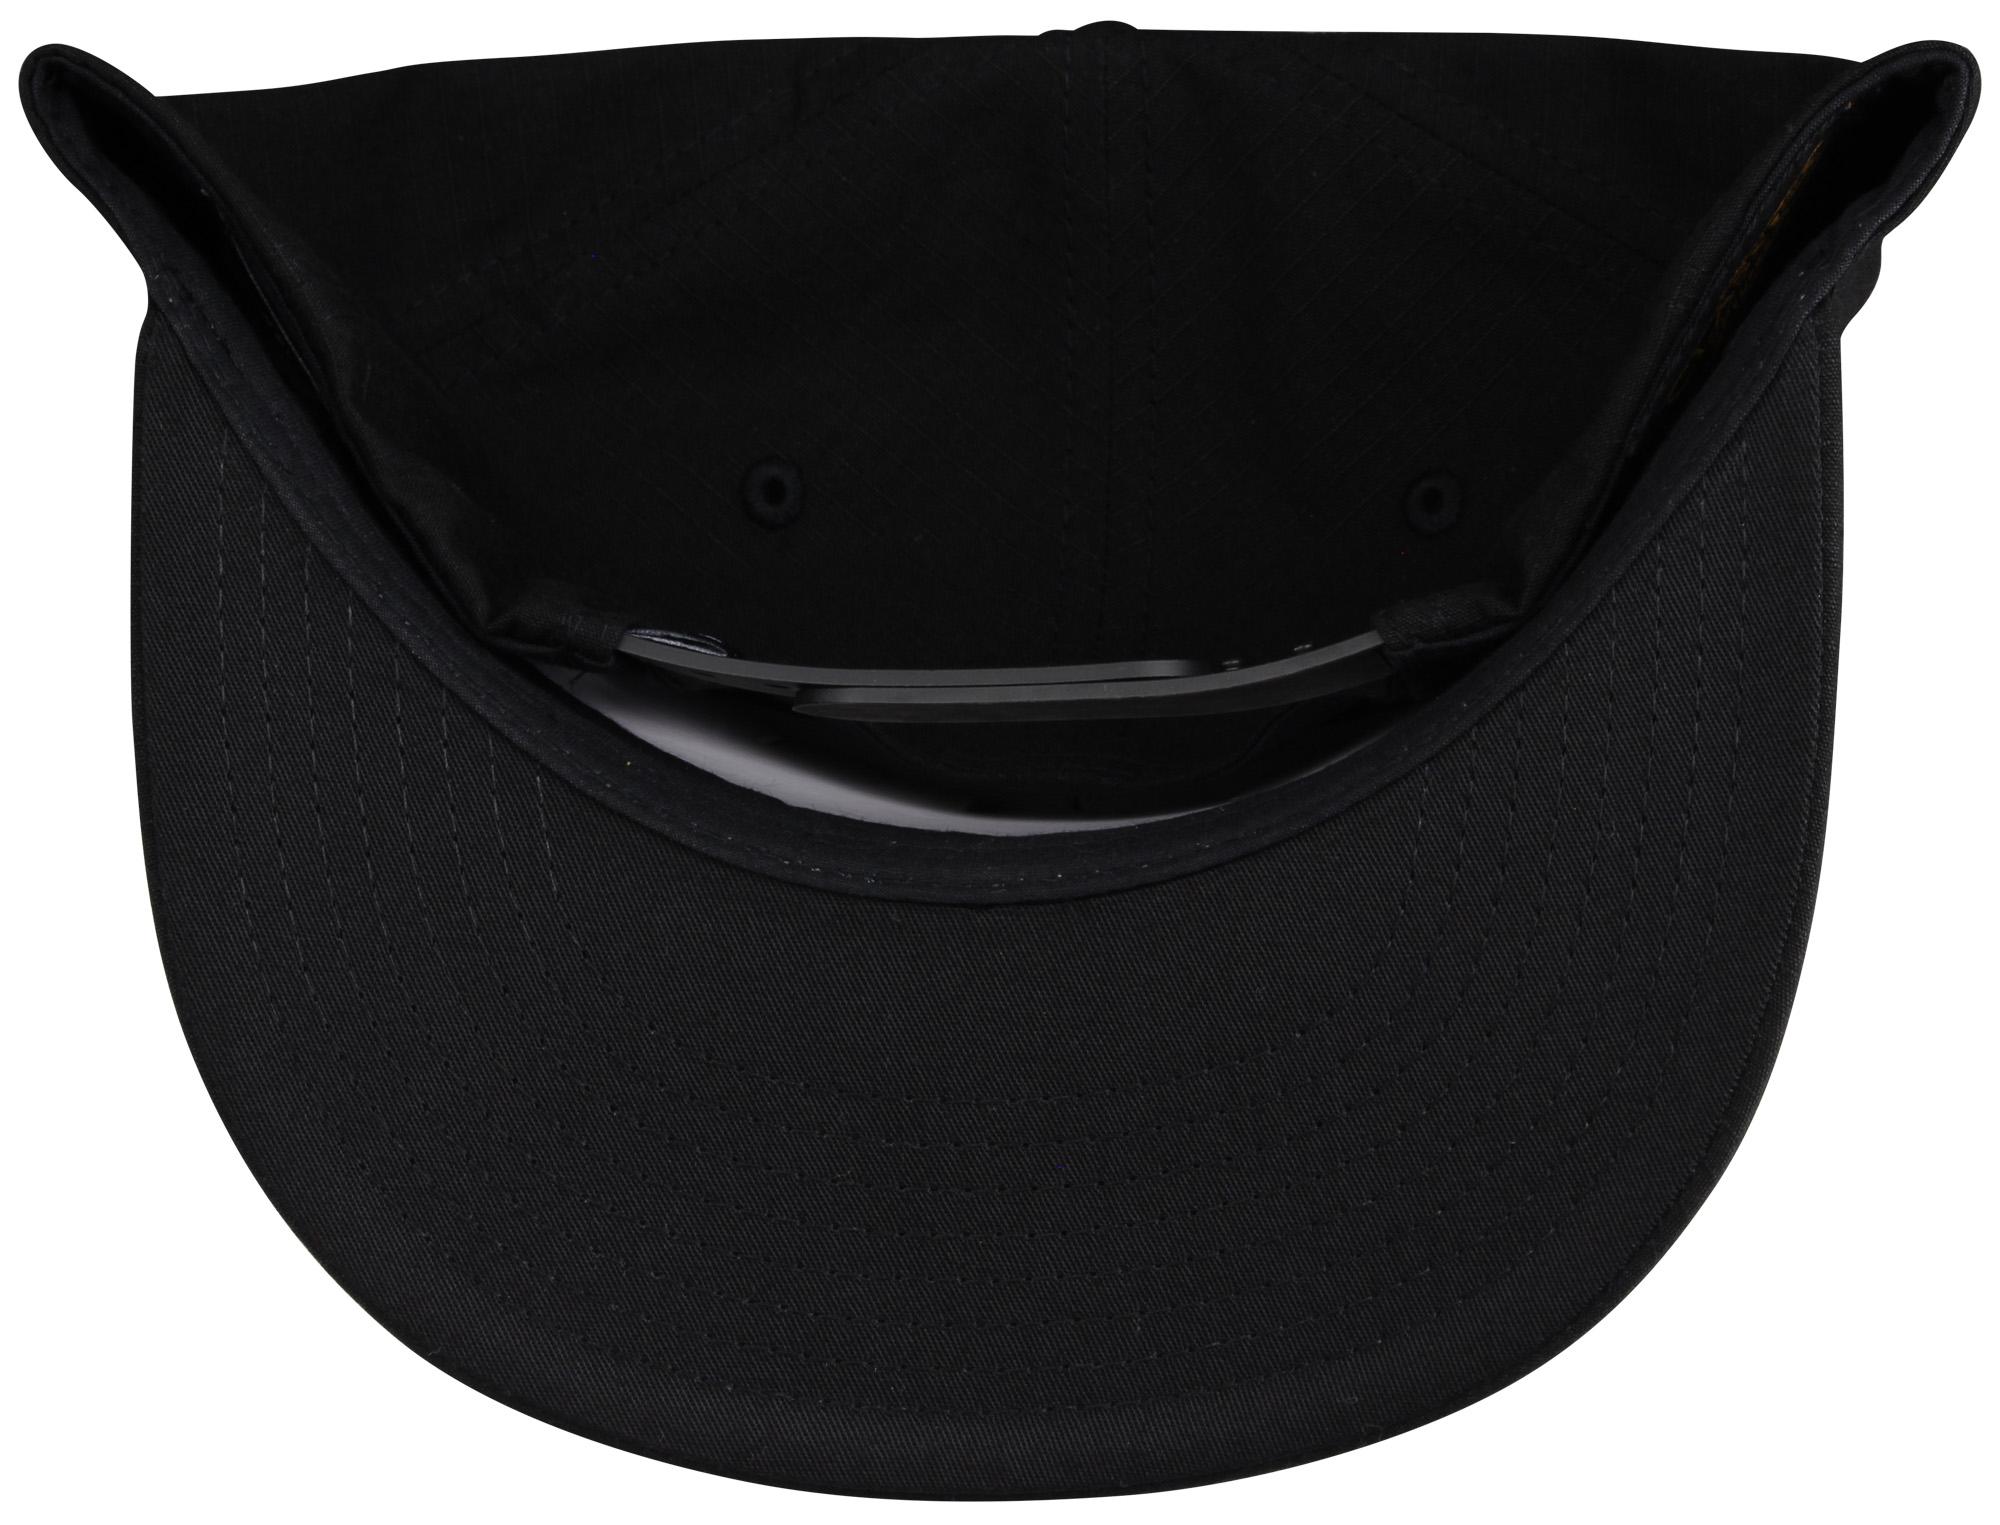 timeless design 55e67 b9d52 Quiksilver Tonal Pride Snapback Hat (Black) 5 5 of 5 See More